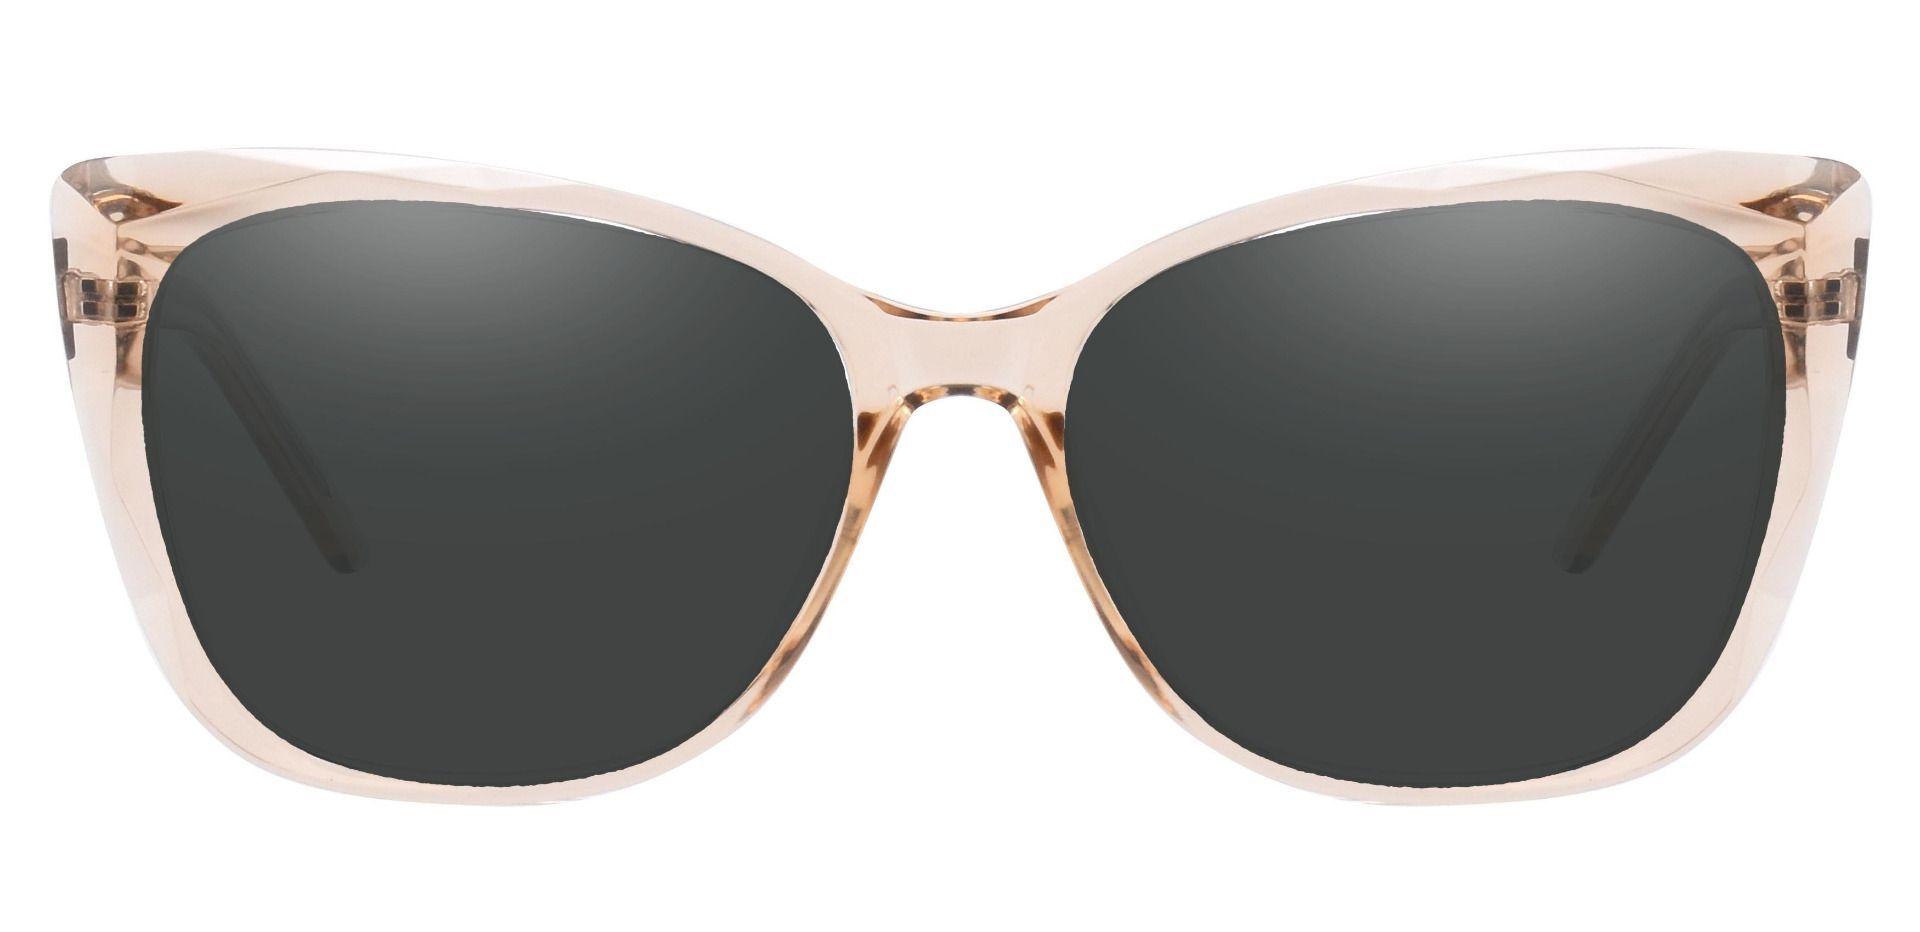 Mabel Square Progressive Sunglasses - Brown Frame With Gray Lenses